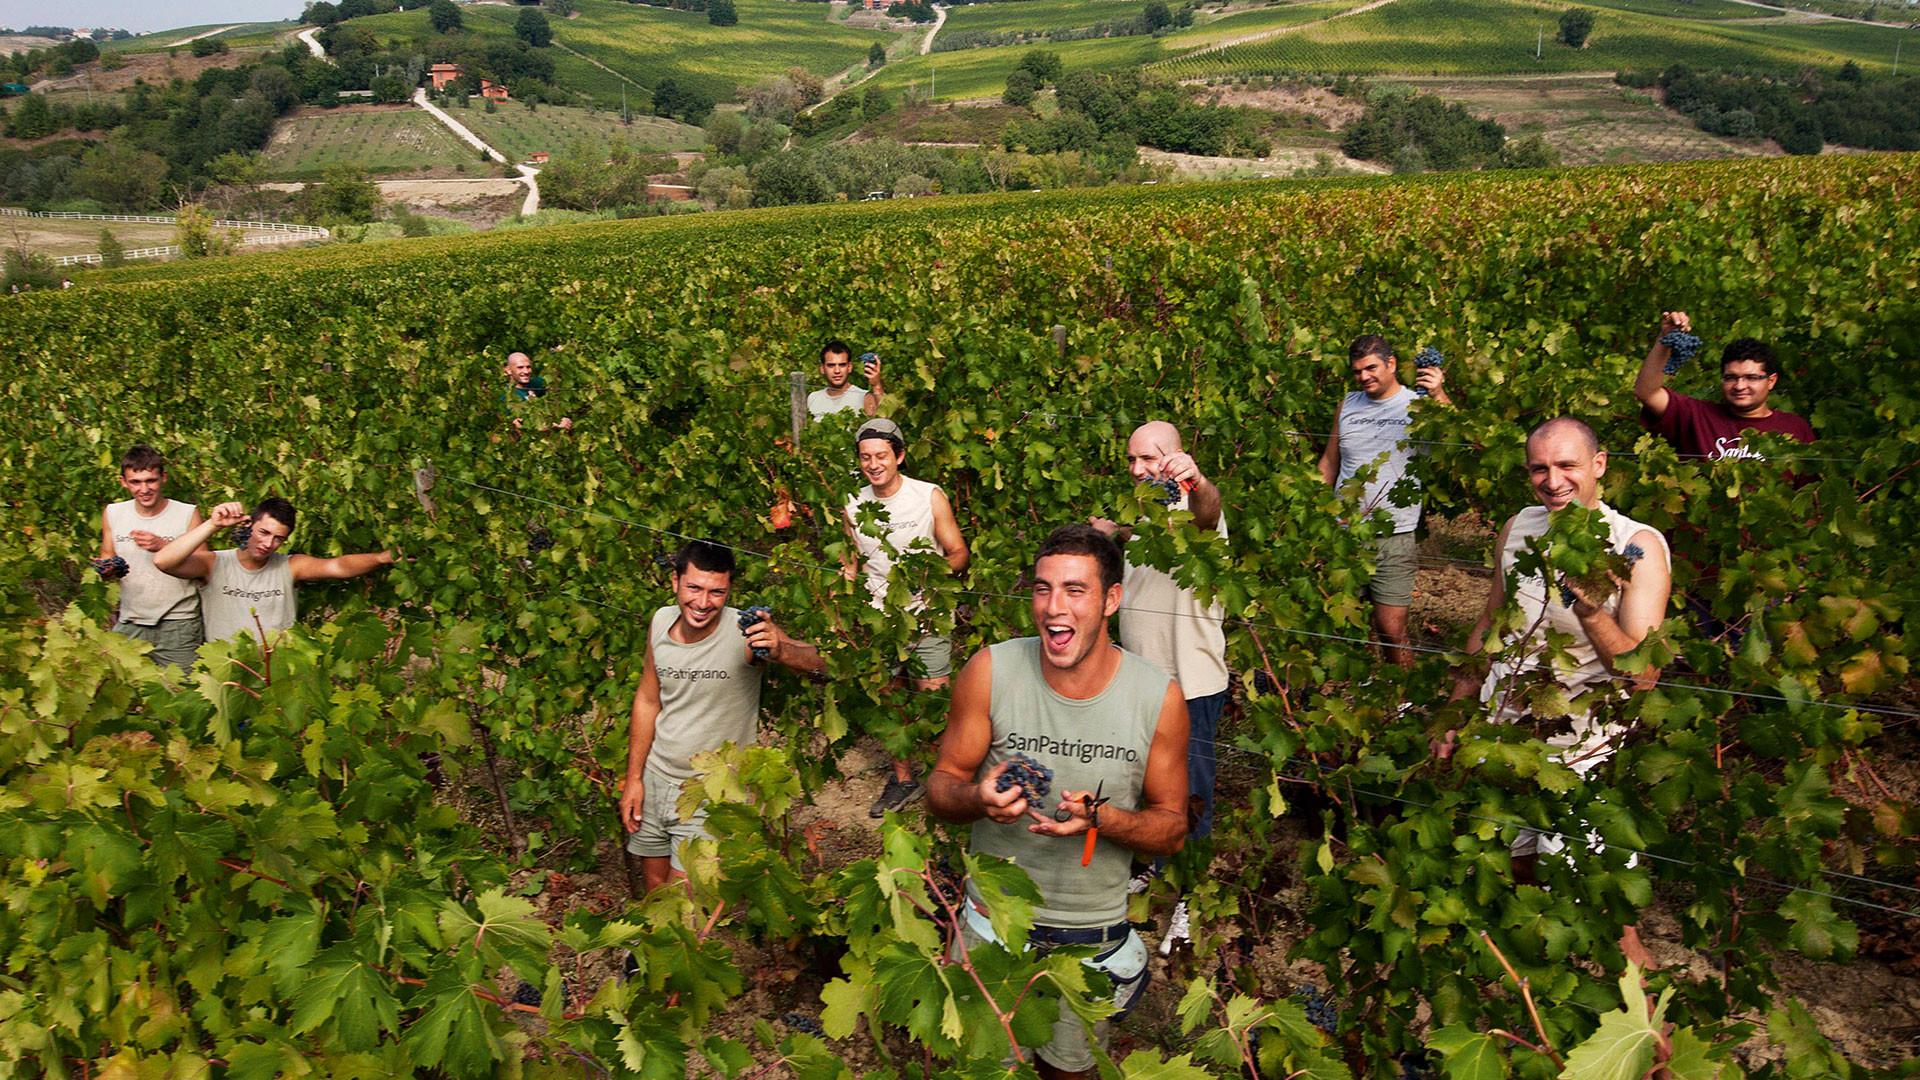 Residents in the vineyards, San Patrignano, Italy